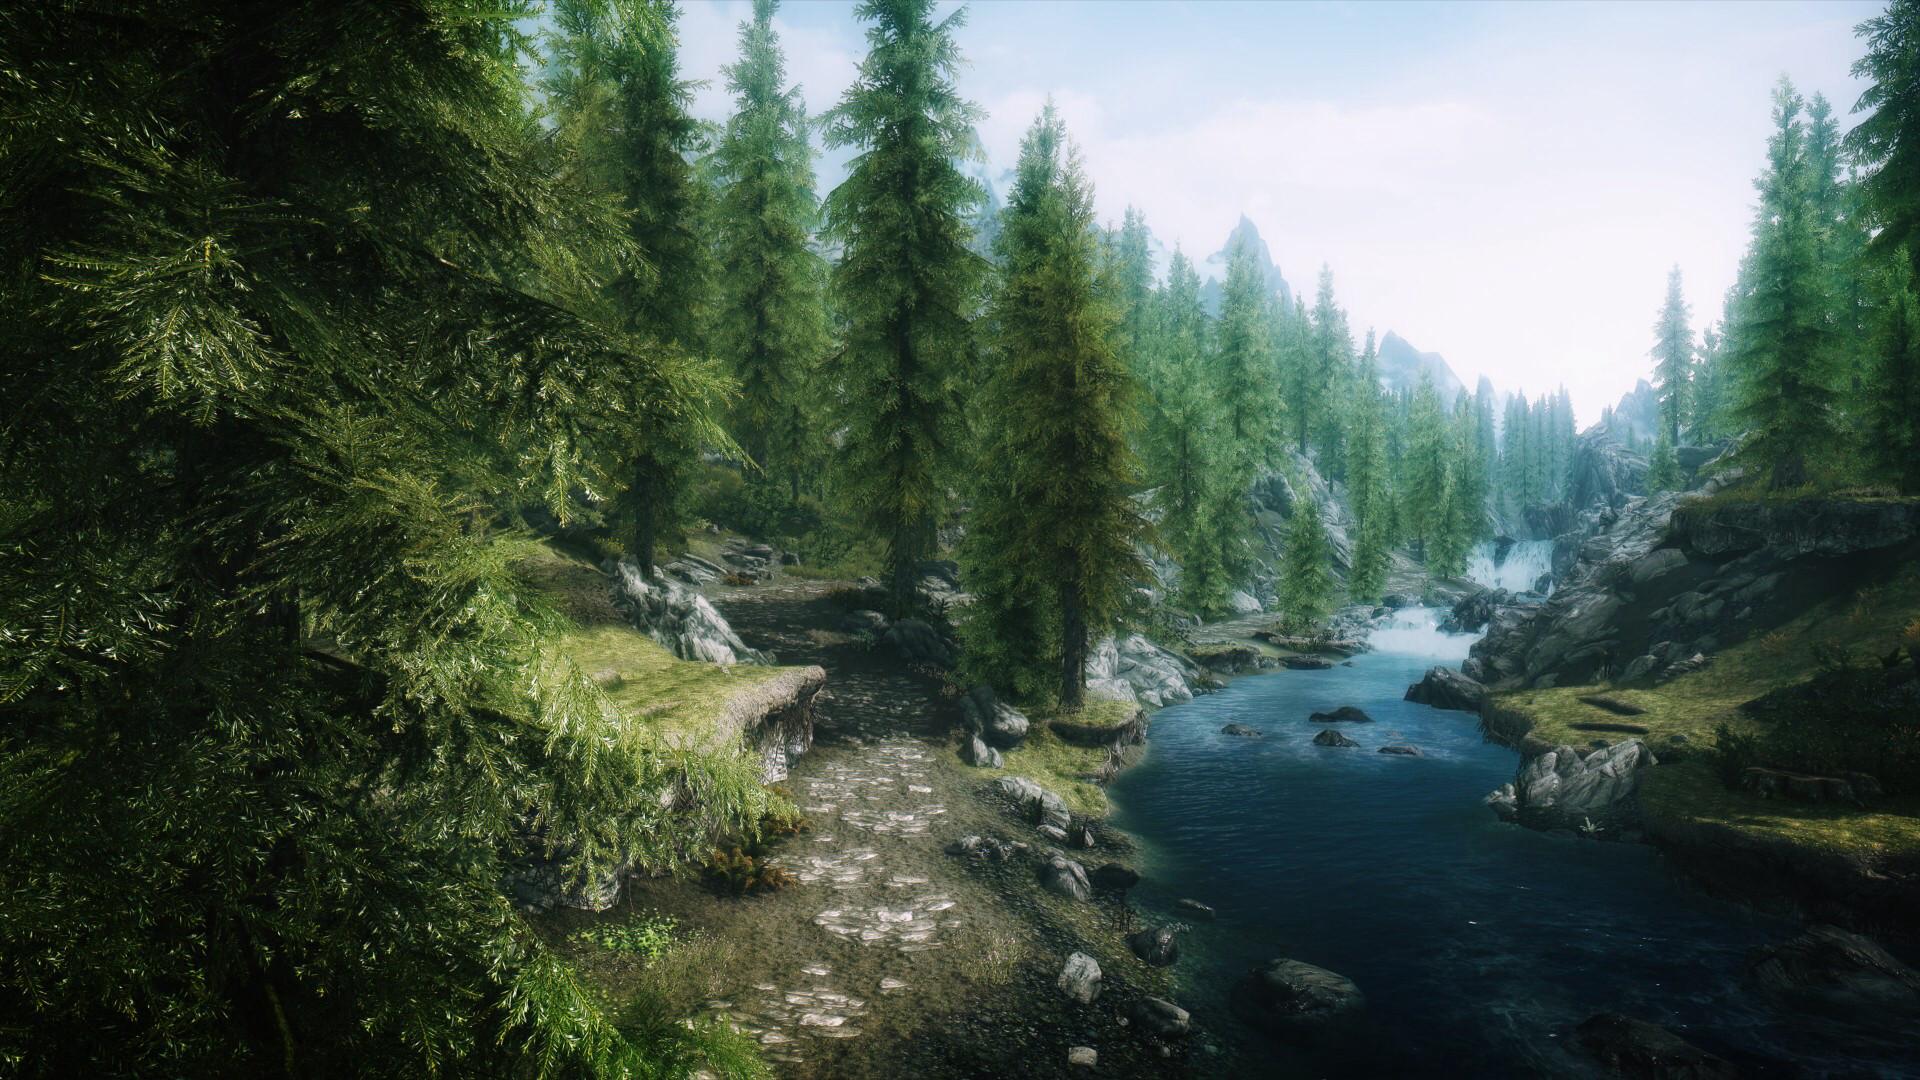 Skyrim's beautiful scenery